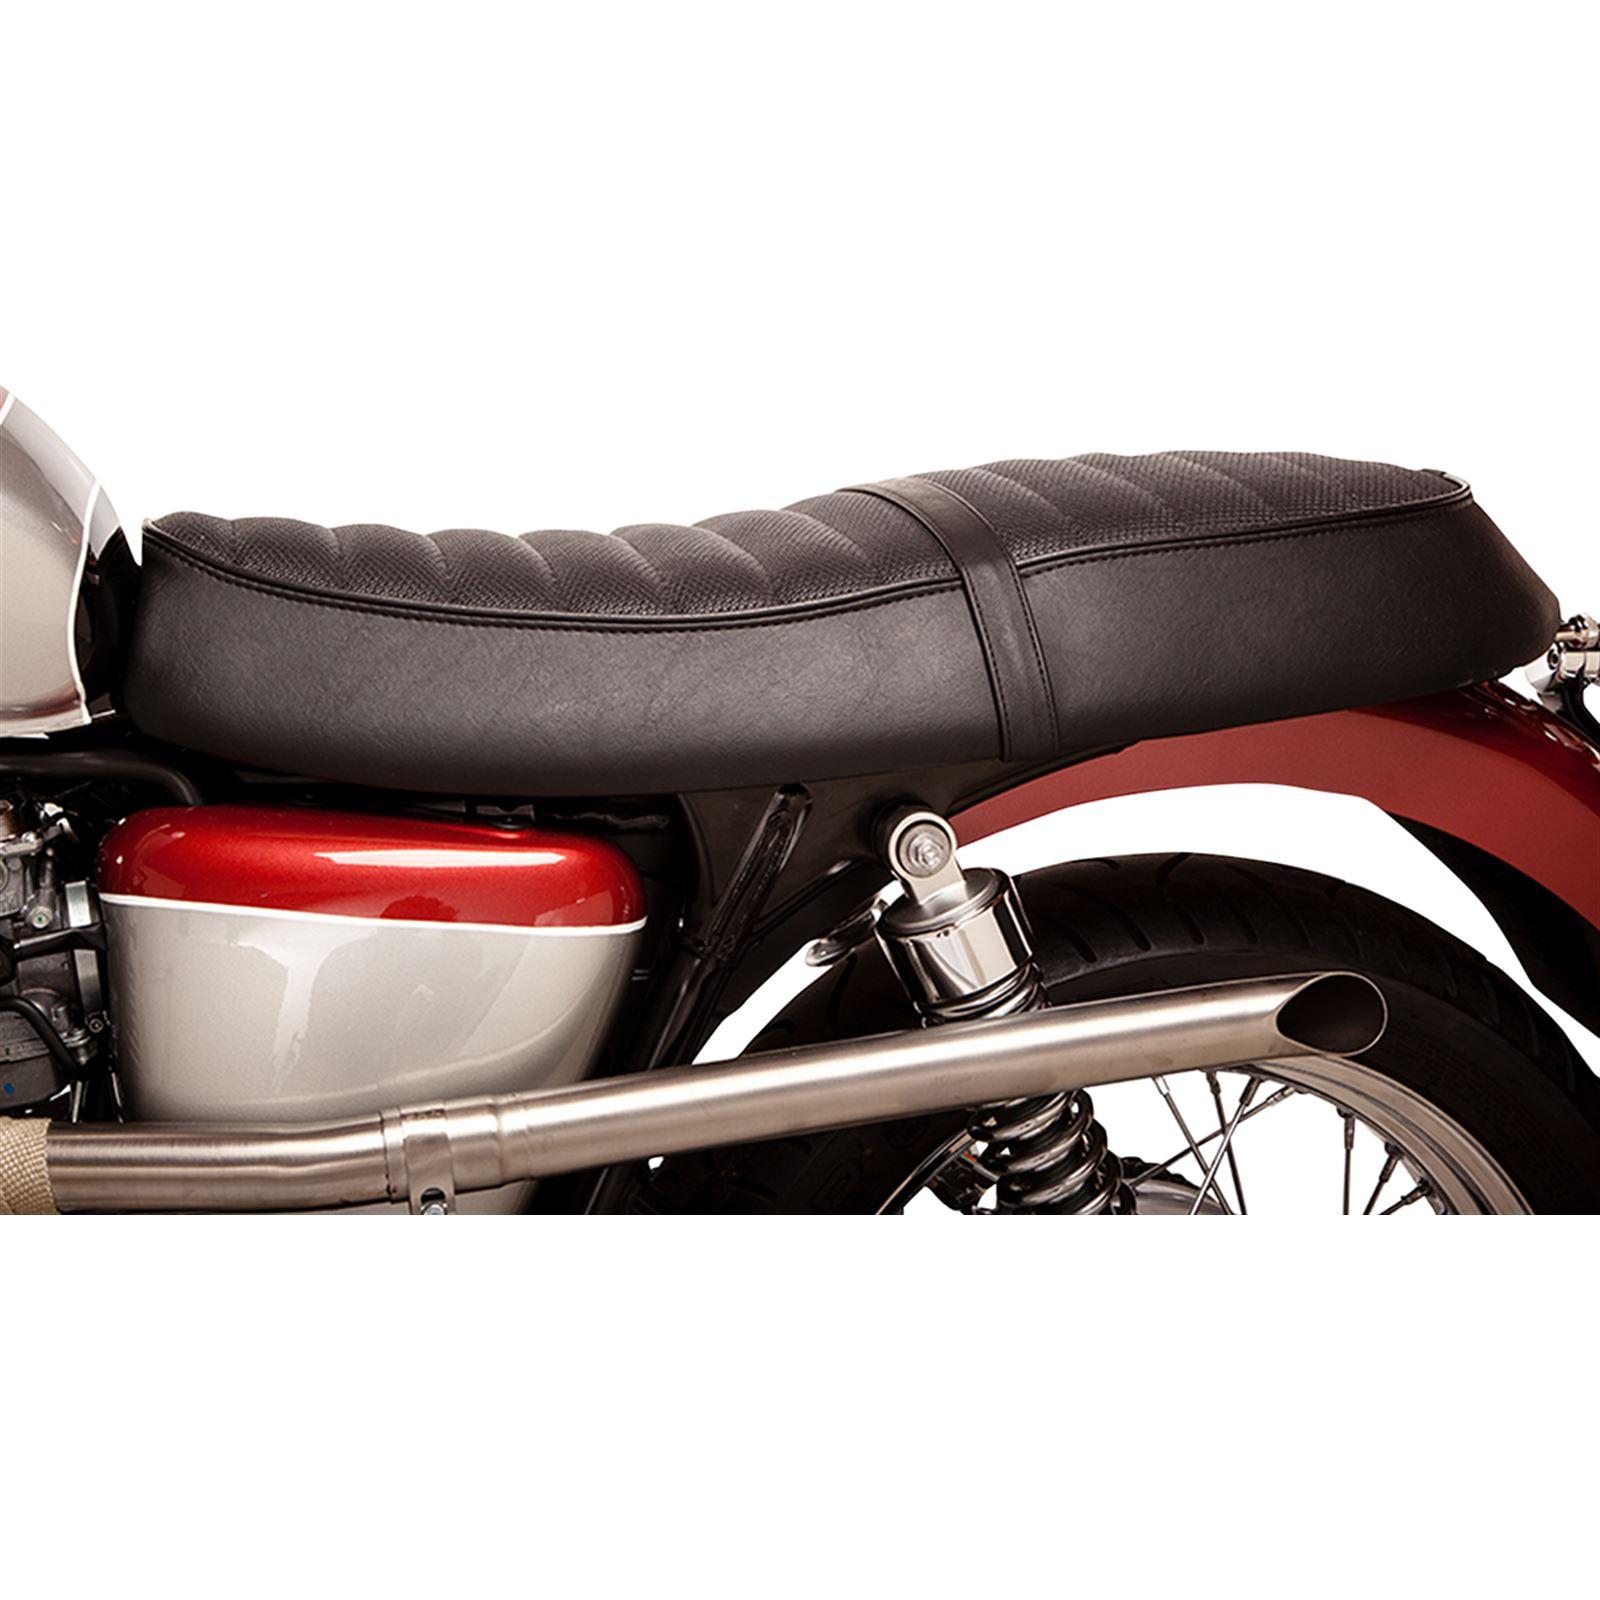 British Customs Black Seat Cover - Perforated Top